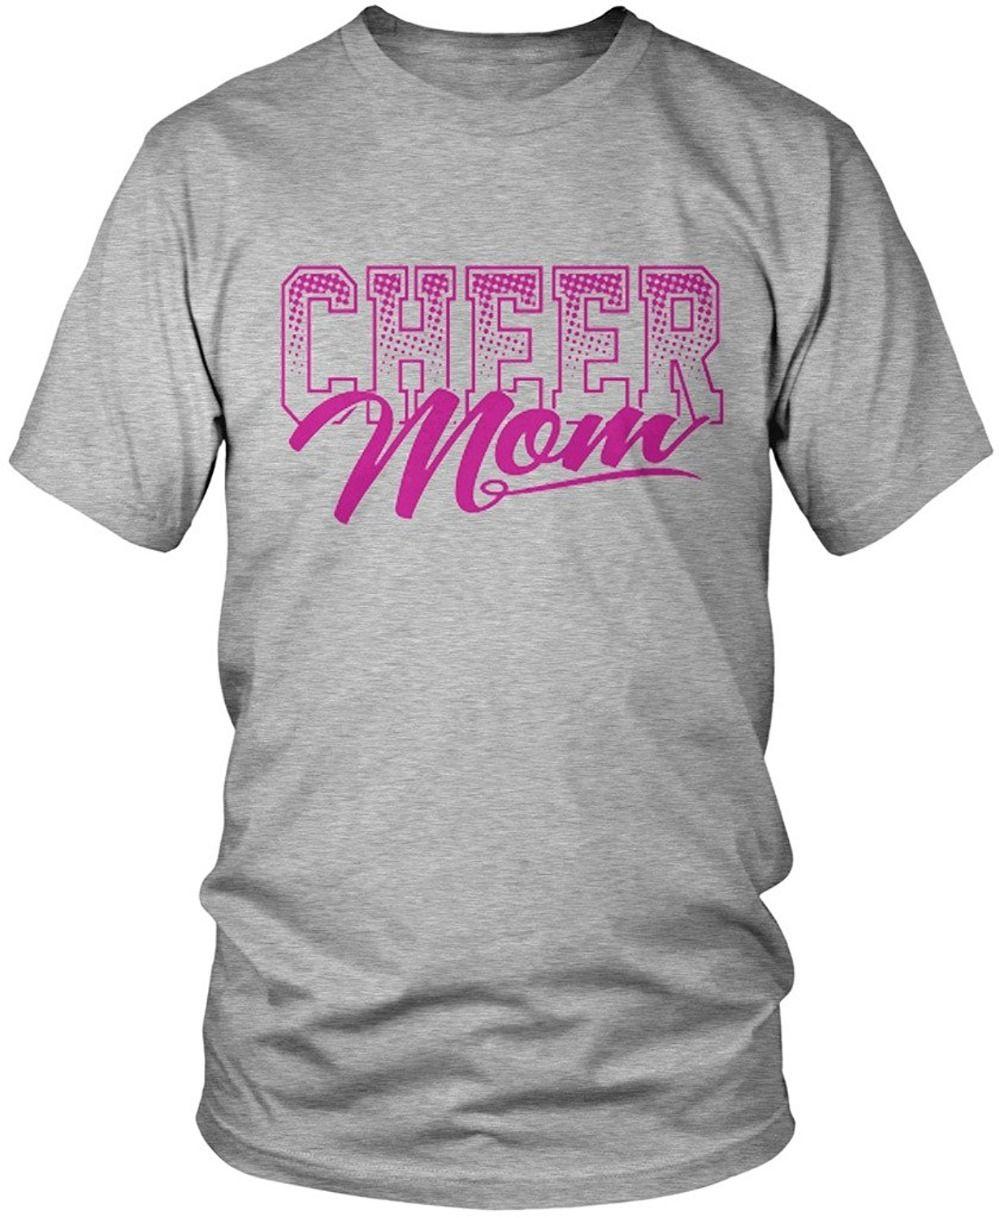 Cool T Shirts Fashion 2016 Cheer Mom Mens T Shirt O Neck Short